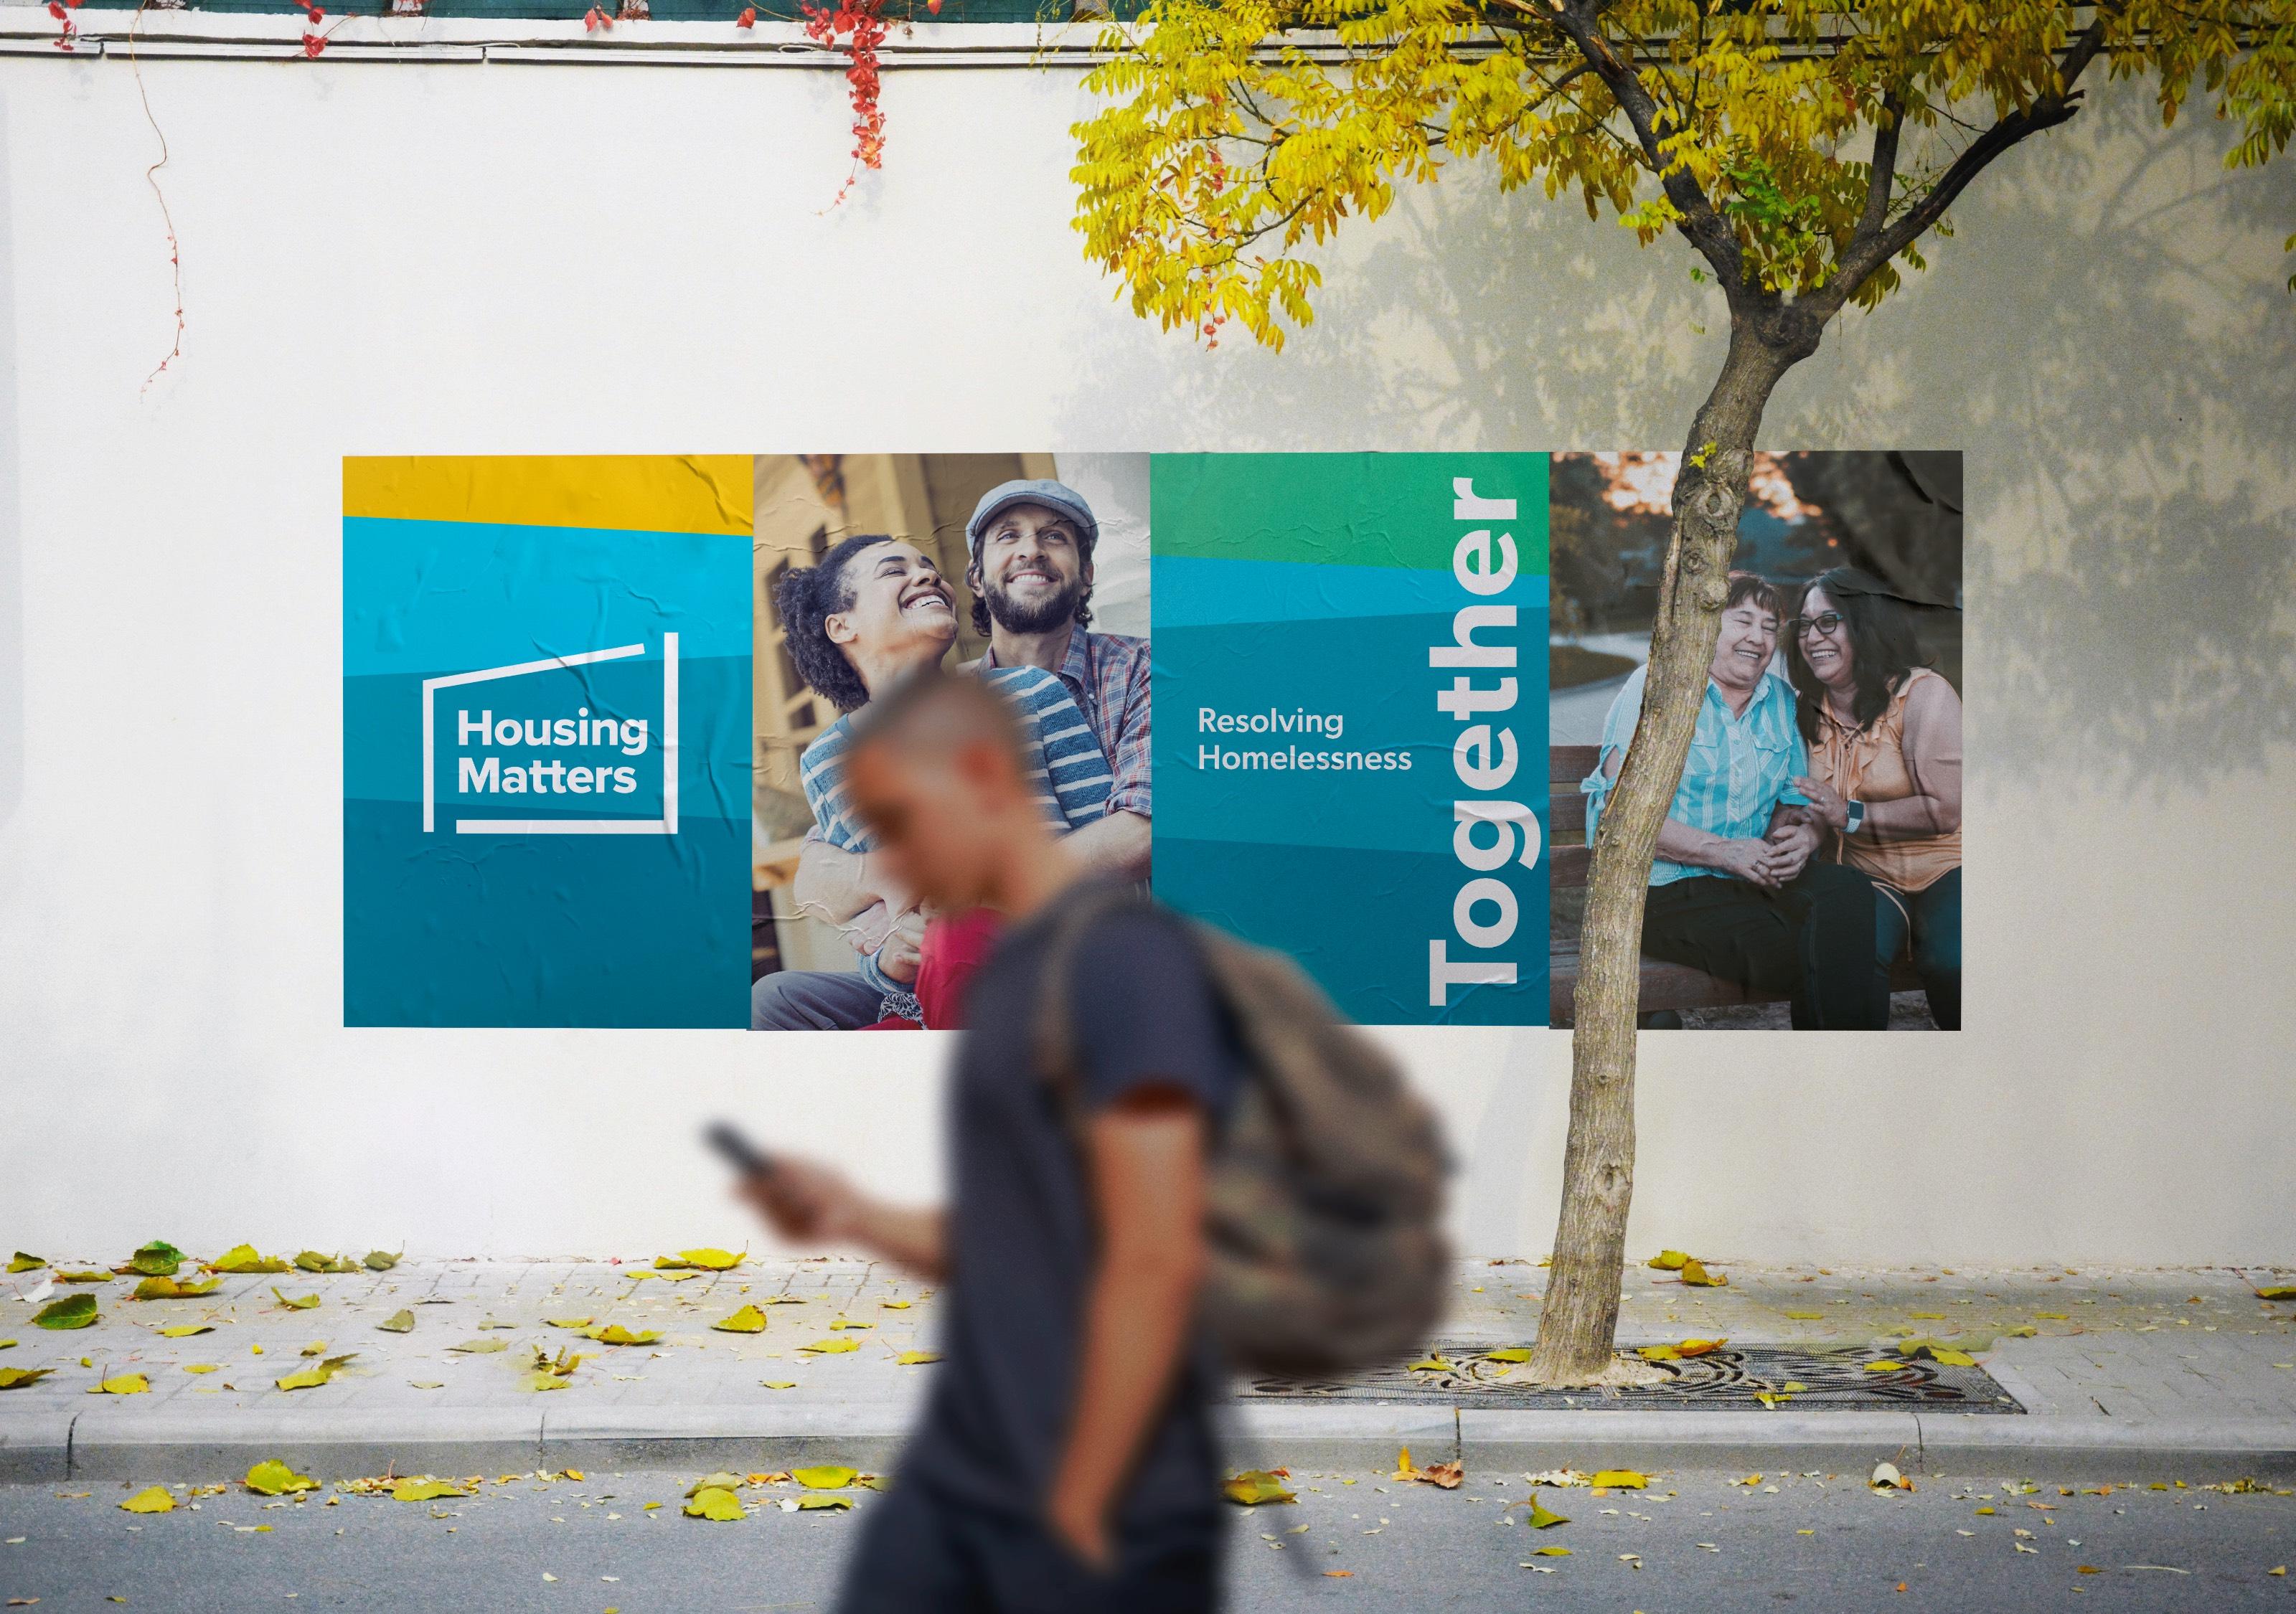 Housing Matters Brand Wall